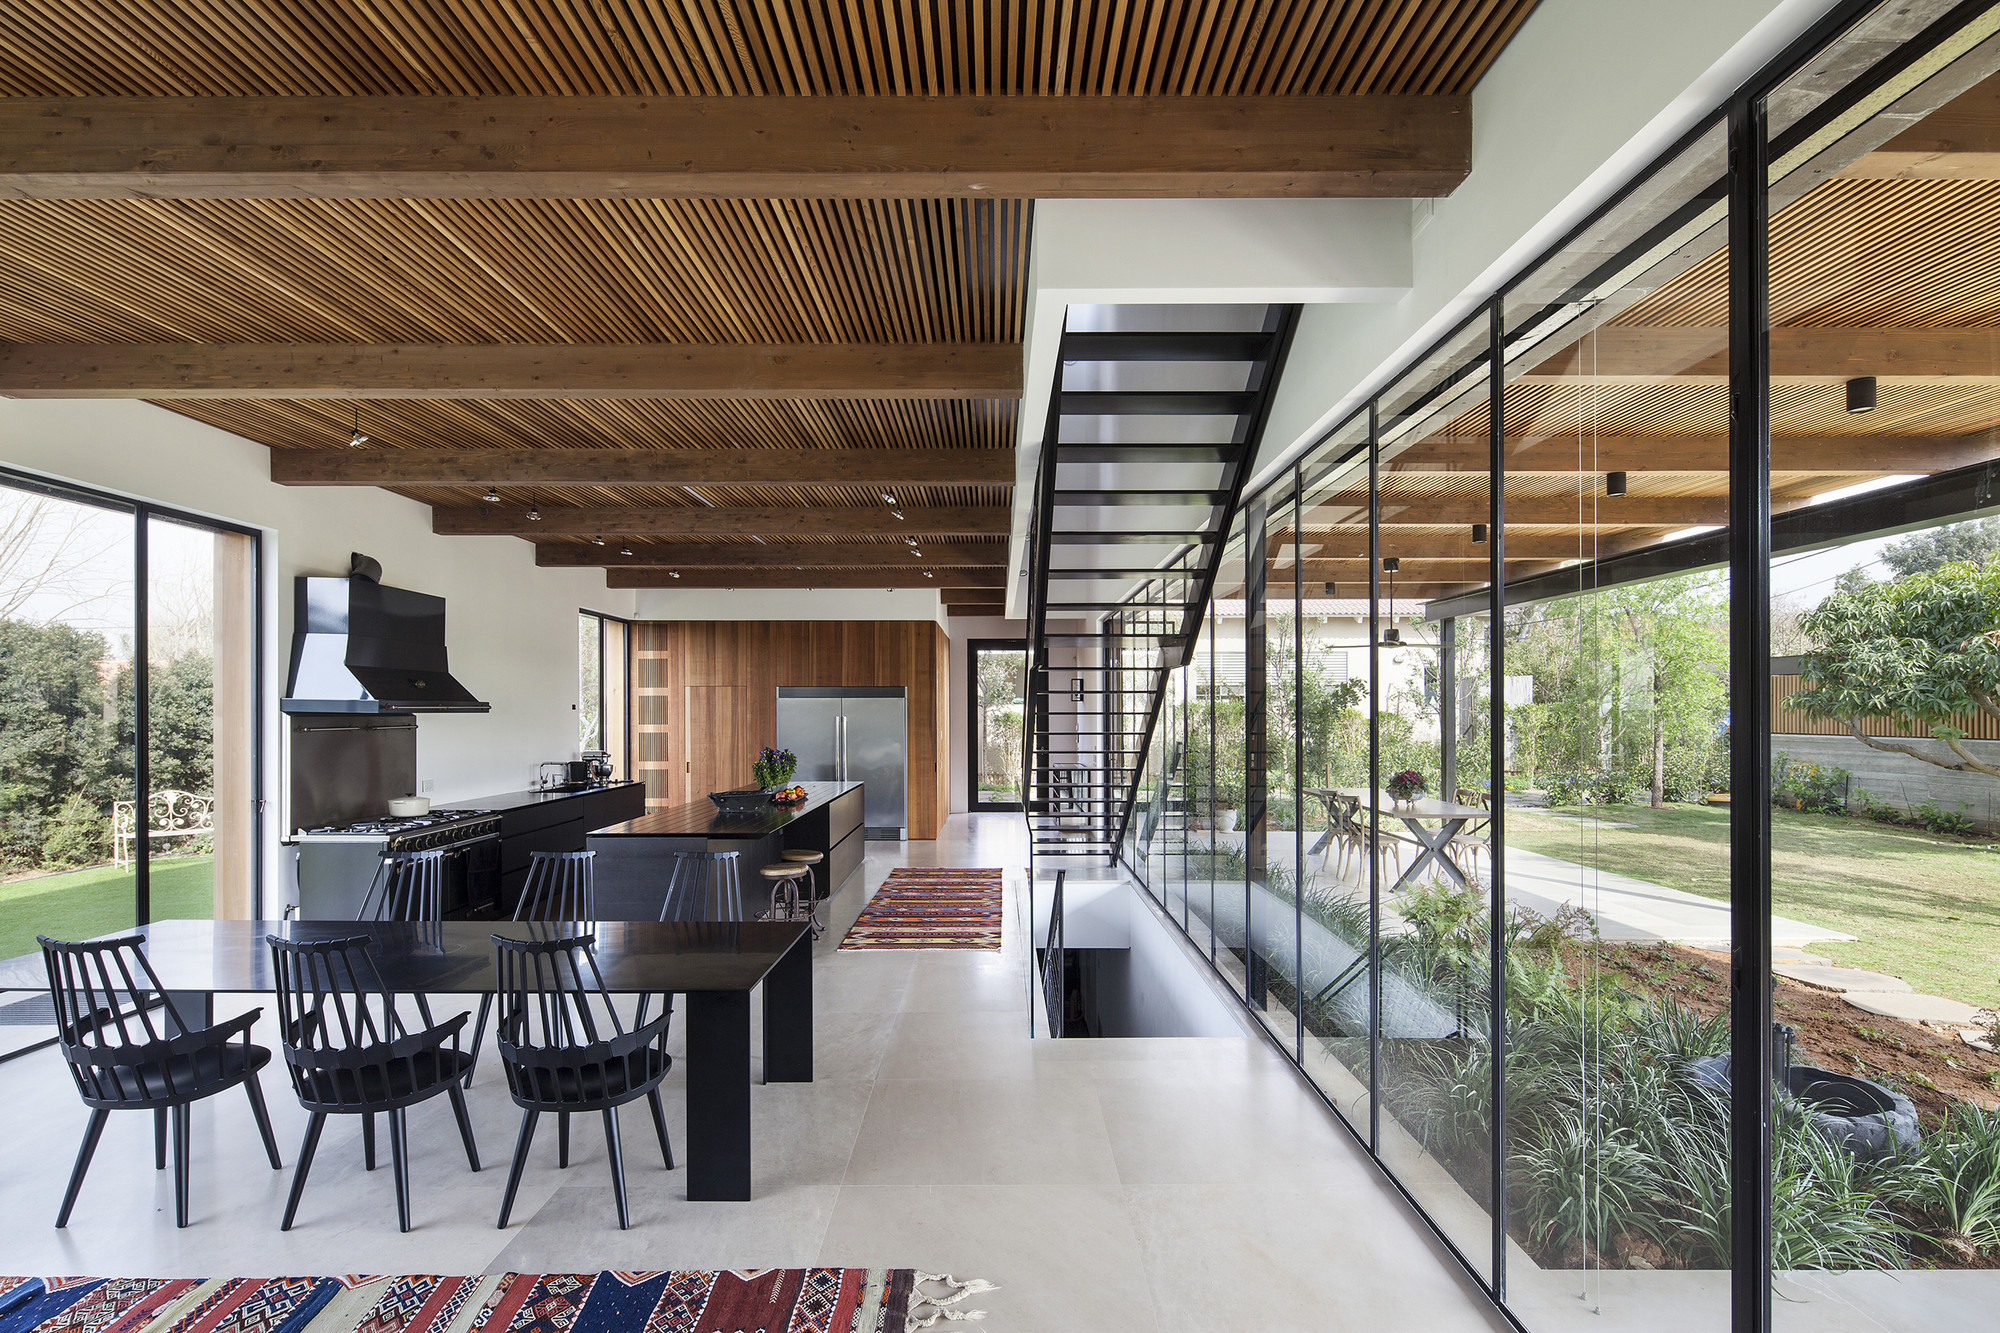 Residencia NS / Blatman-Cohen Architects